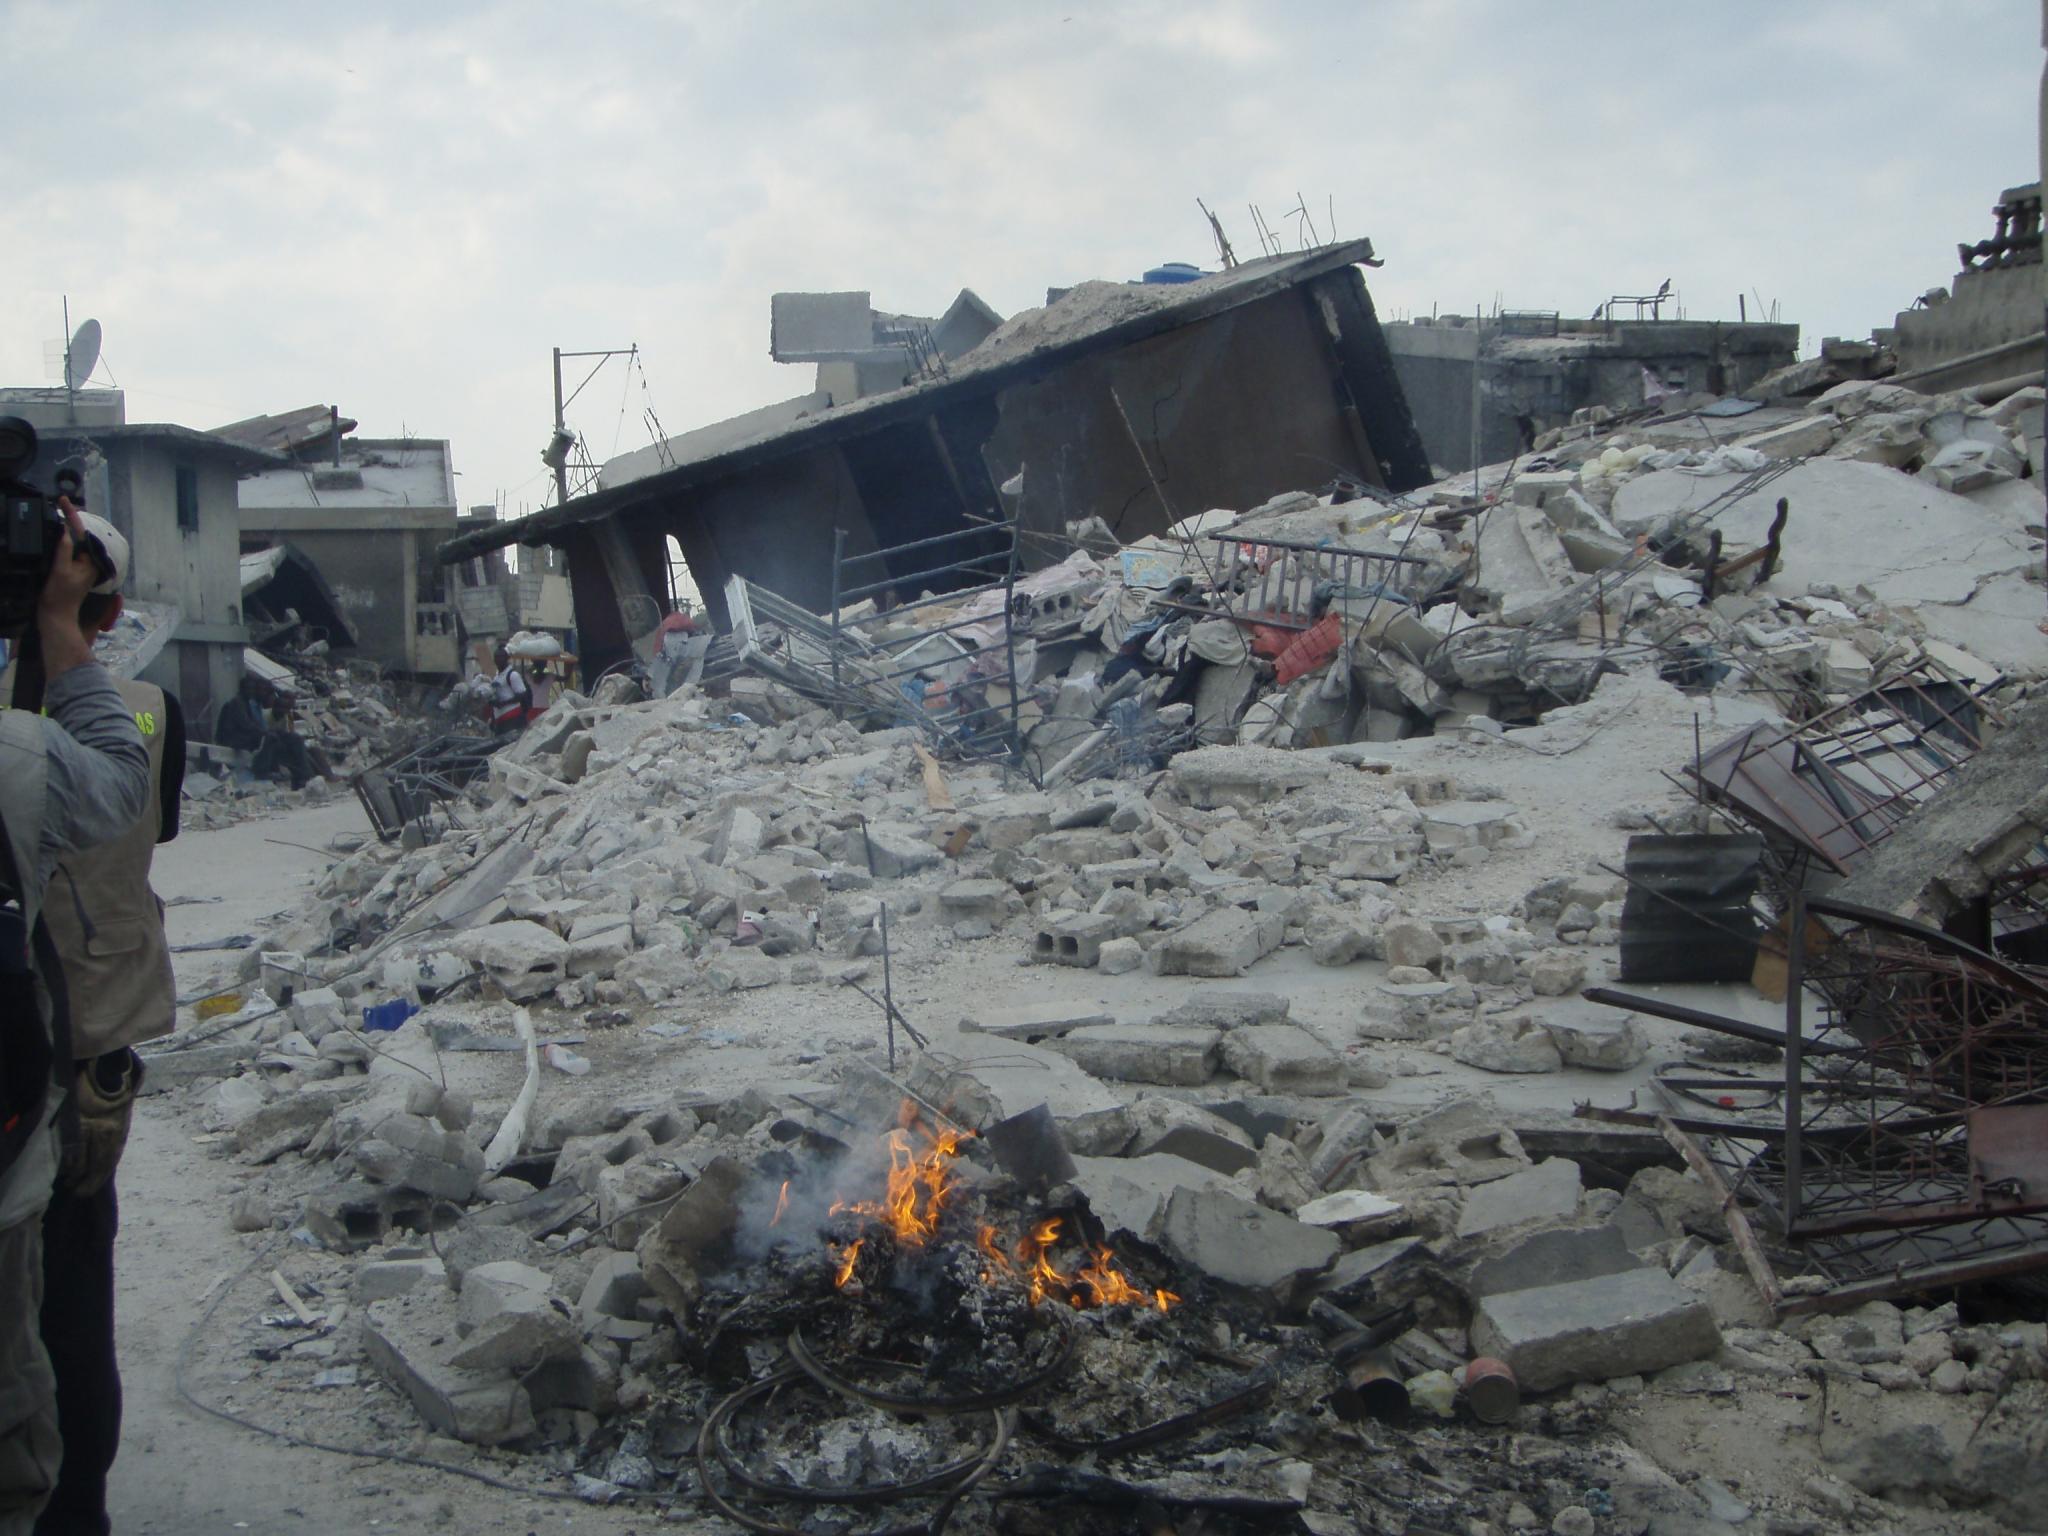 «Hay zonas donde tiran gasoil sobre los escombros para quemar cadáveres»